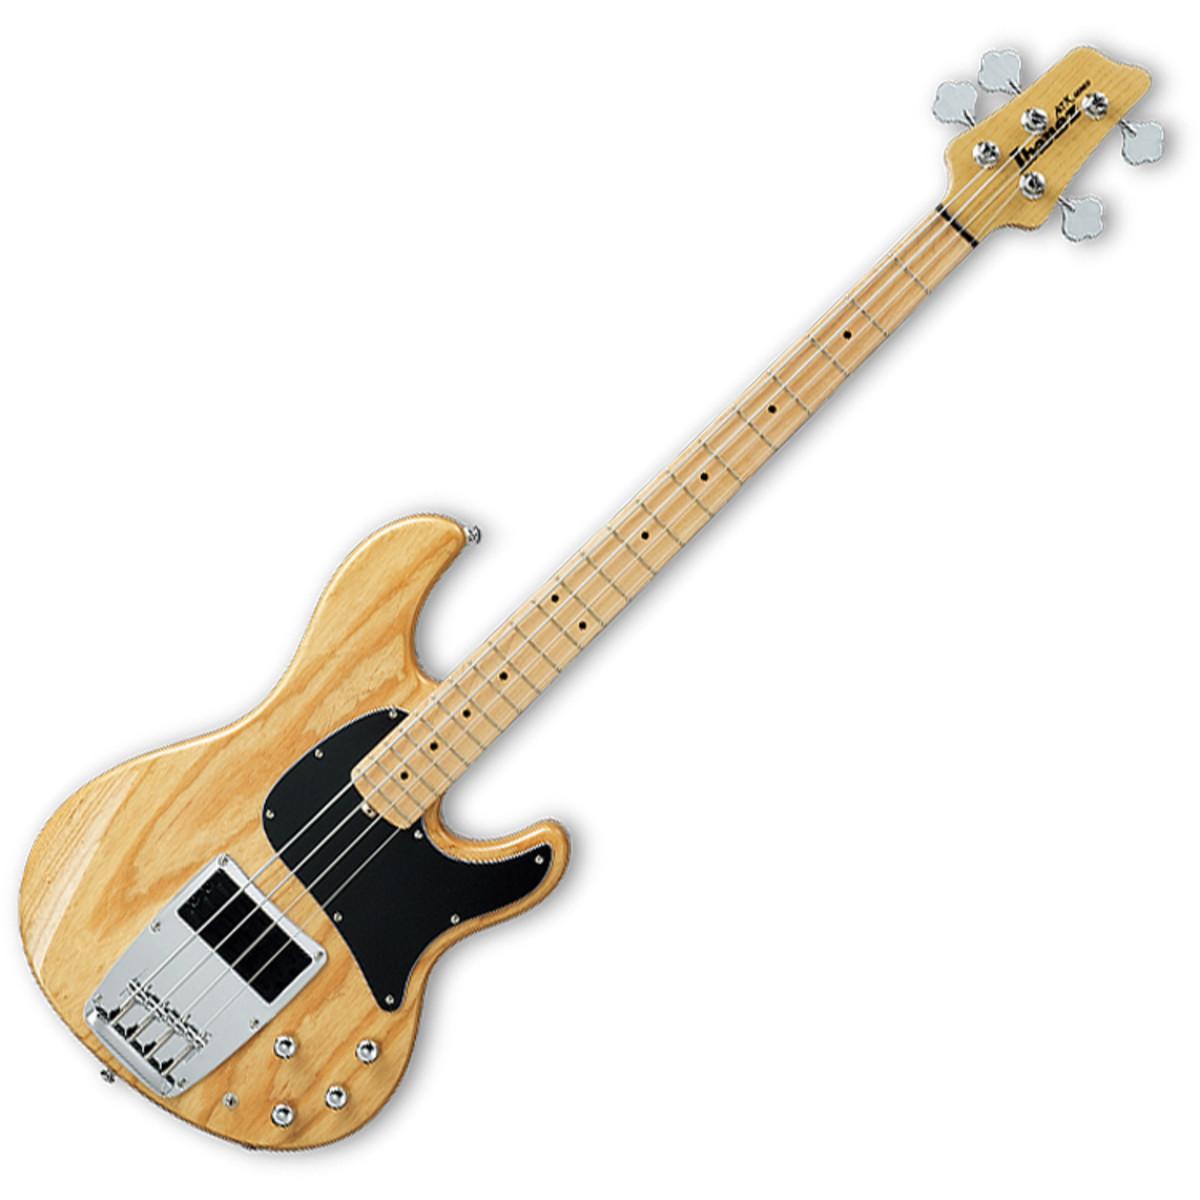 disc ibanez atk300 electric bass guitar natural at gear4music. Black Bedroom Furniture Sets. Home Design Ideas